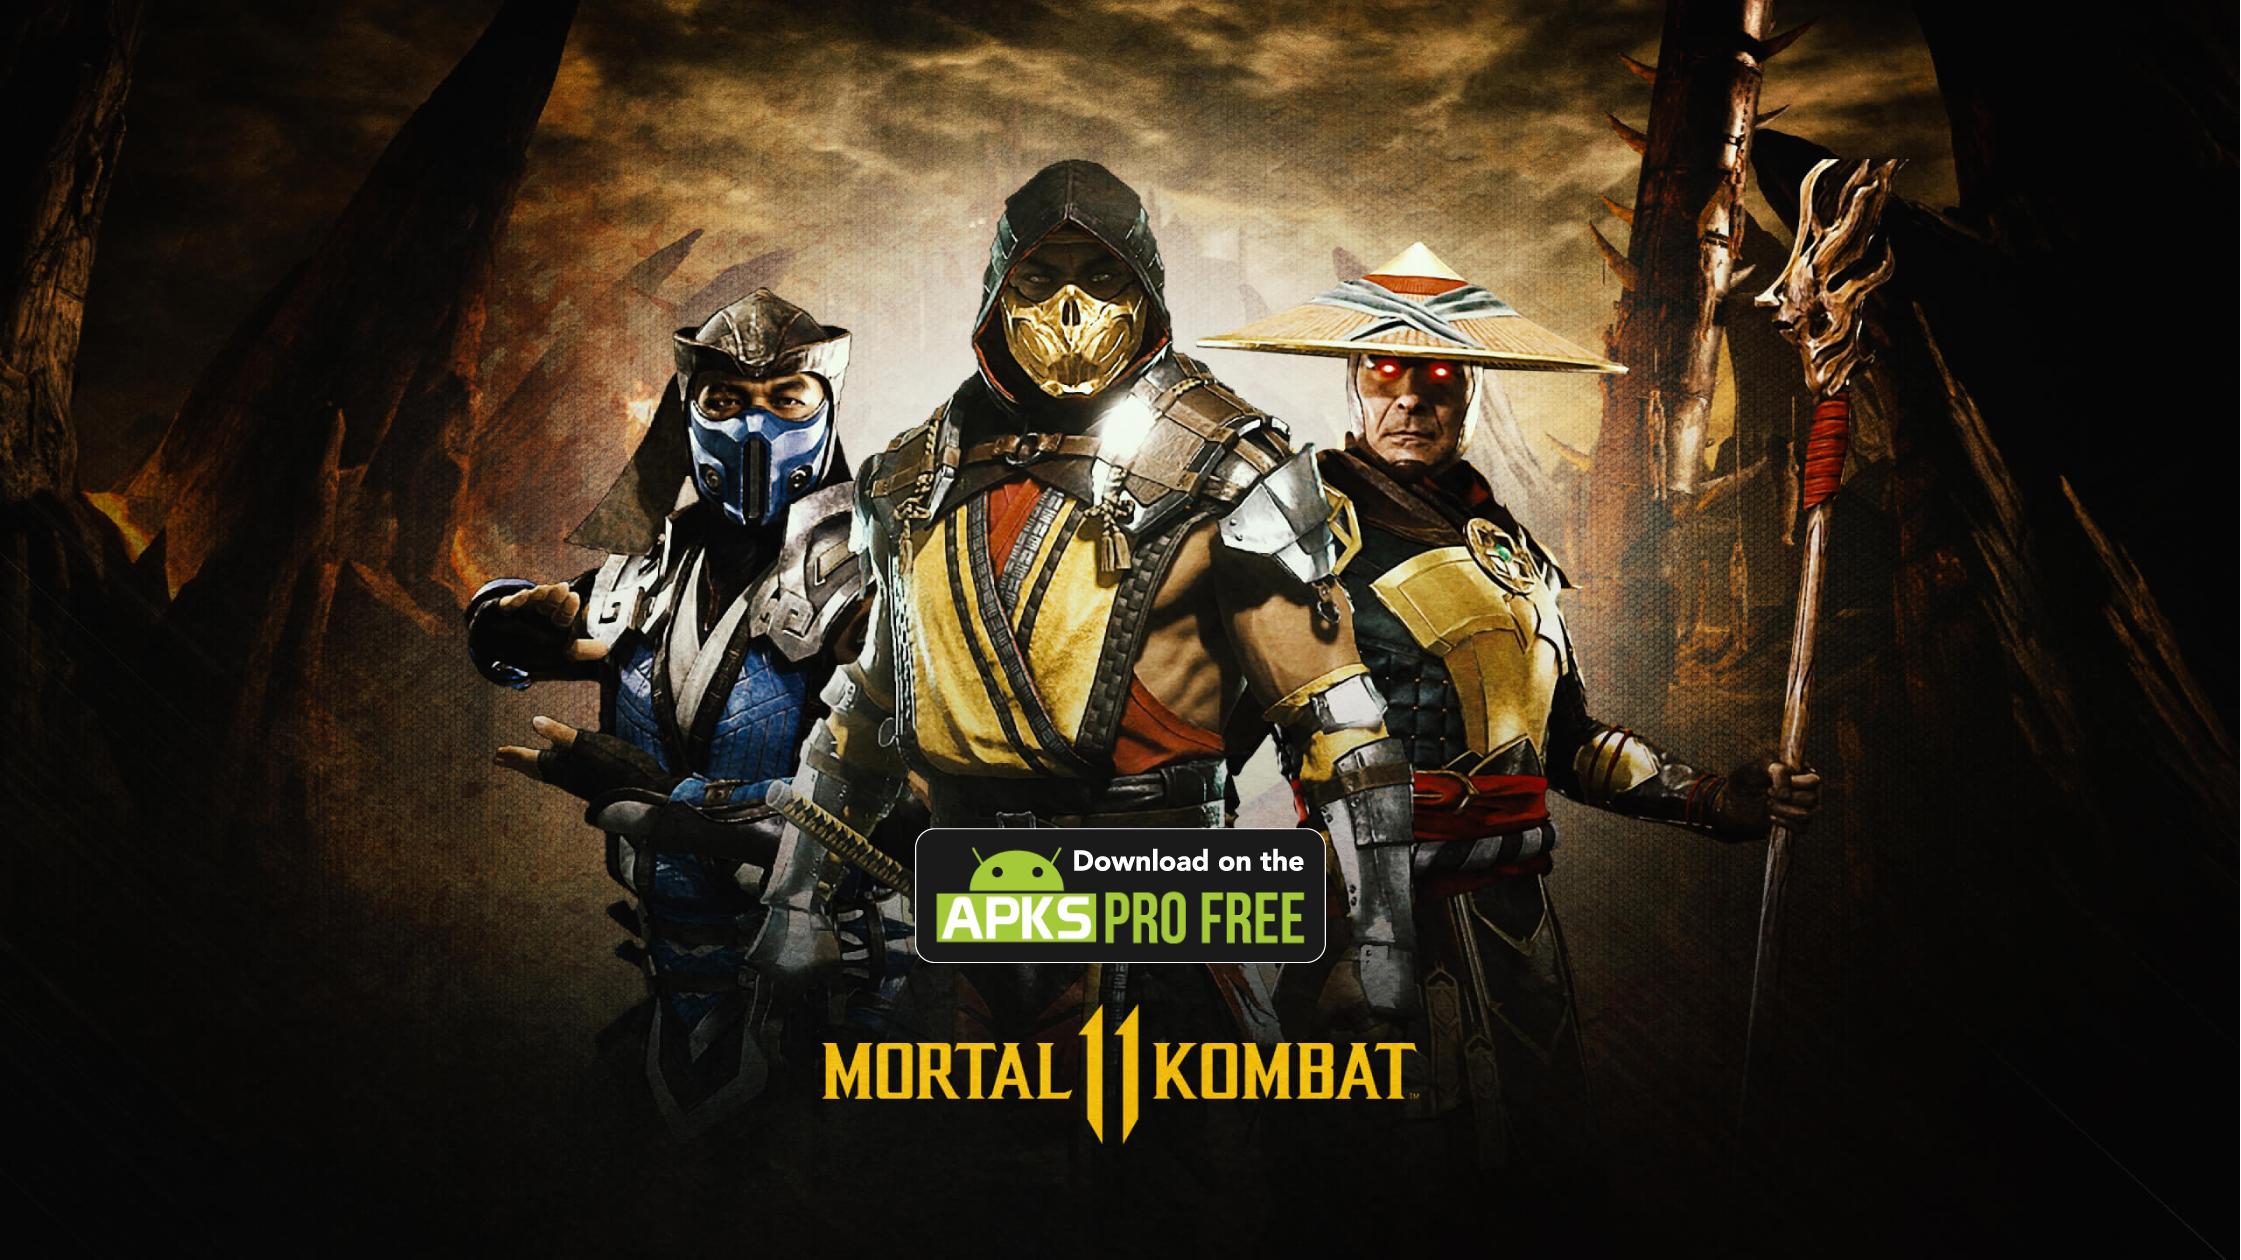 Mortal Kombat's MOD Apk (Unlimited Money/Souls/God Mode)